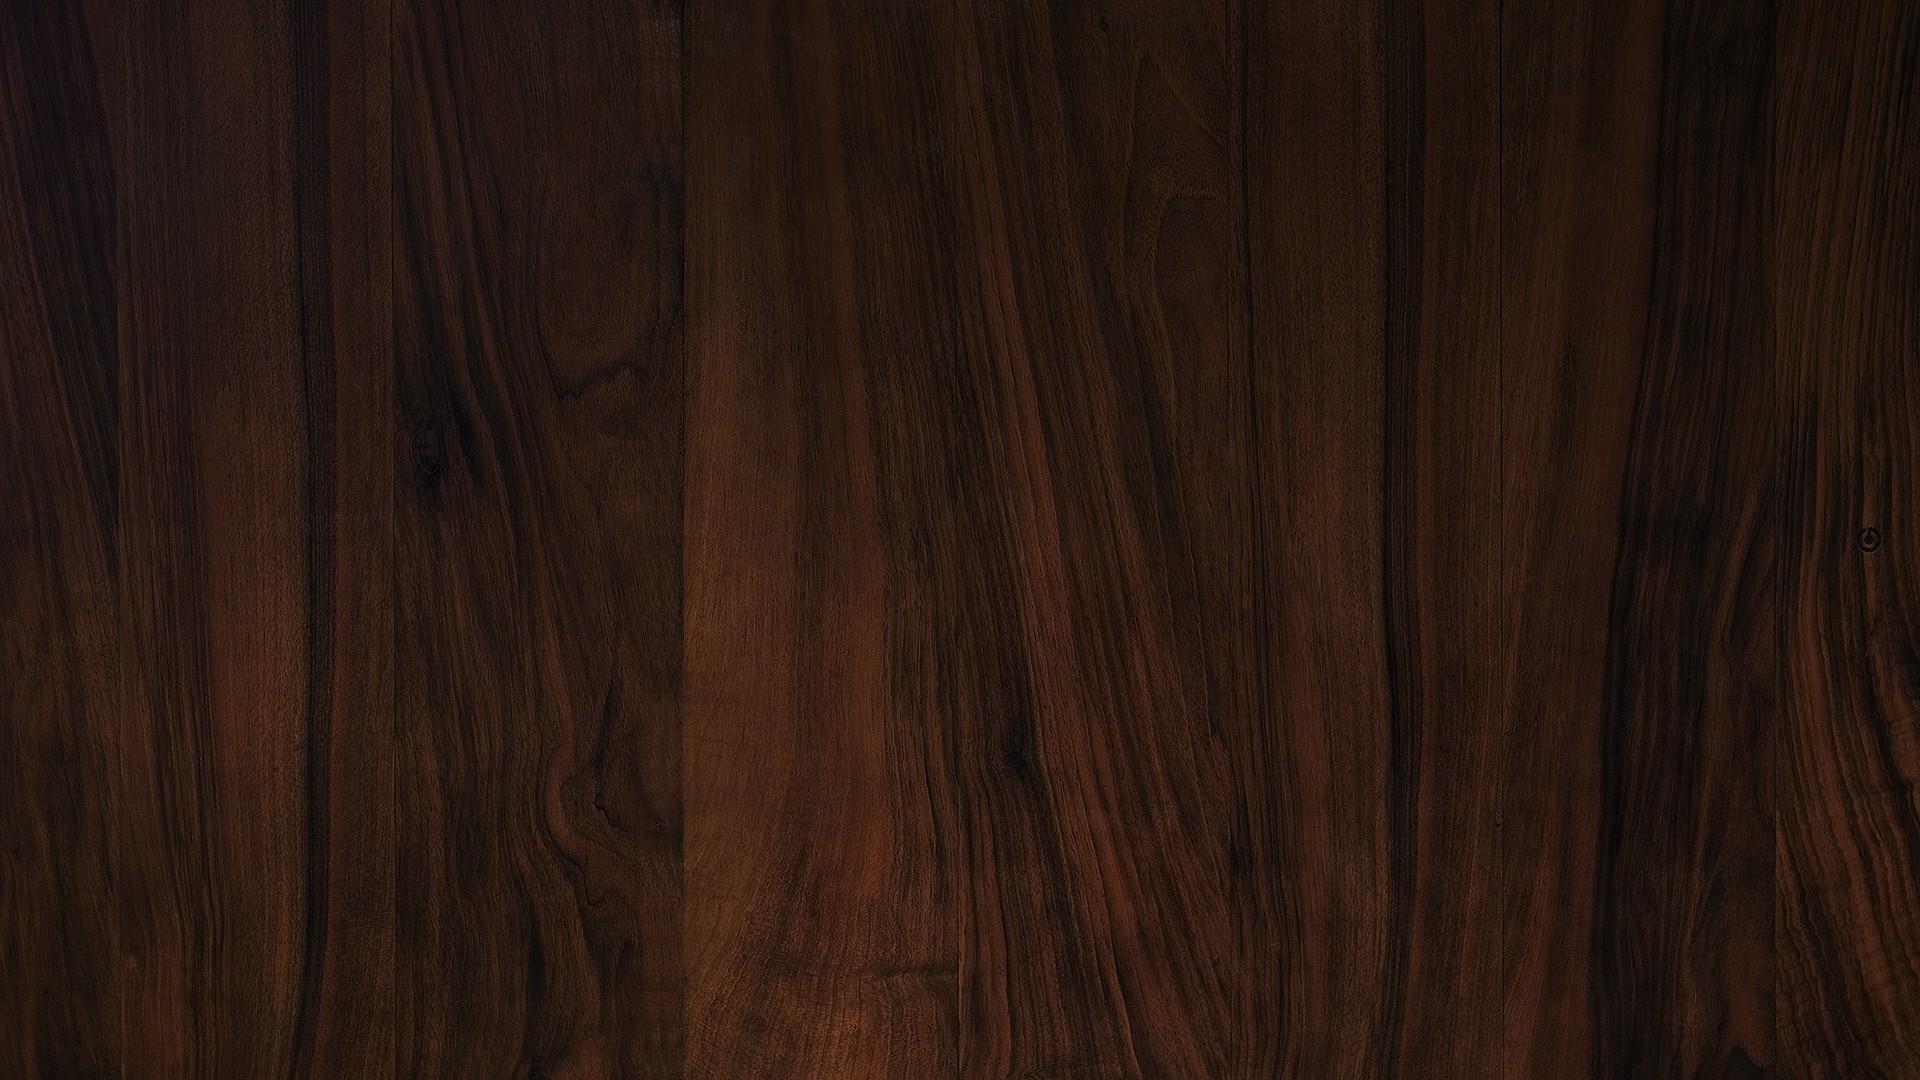 Wood Wallpaper. Wood Wallpaper